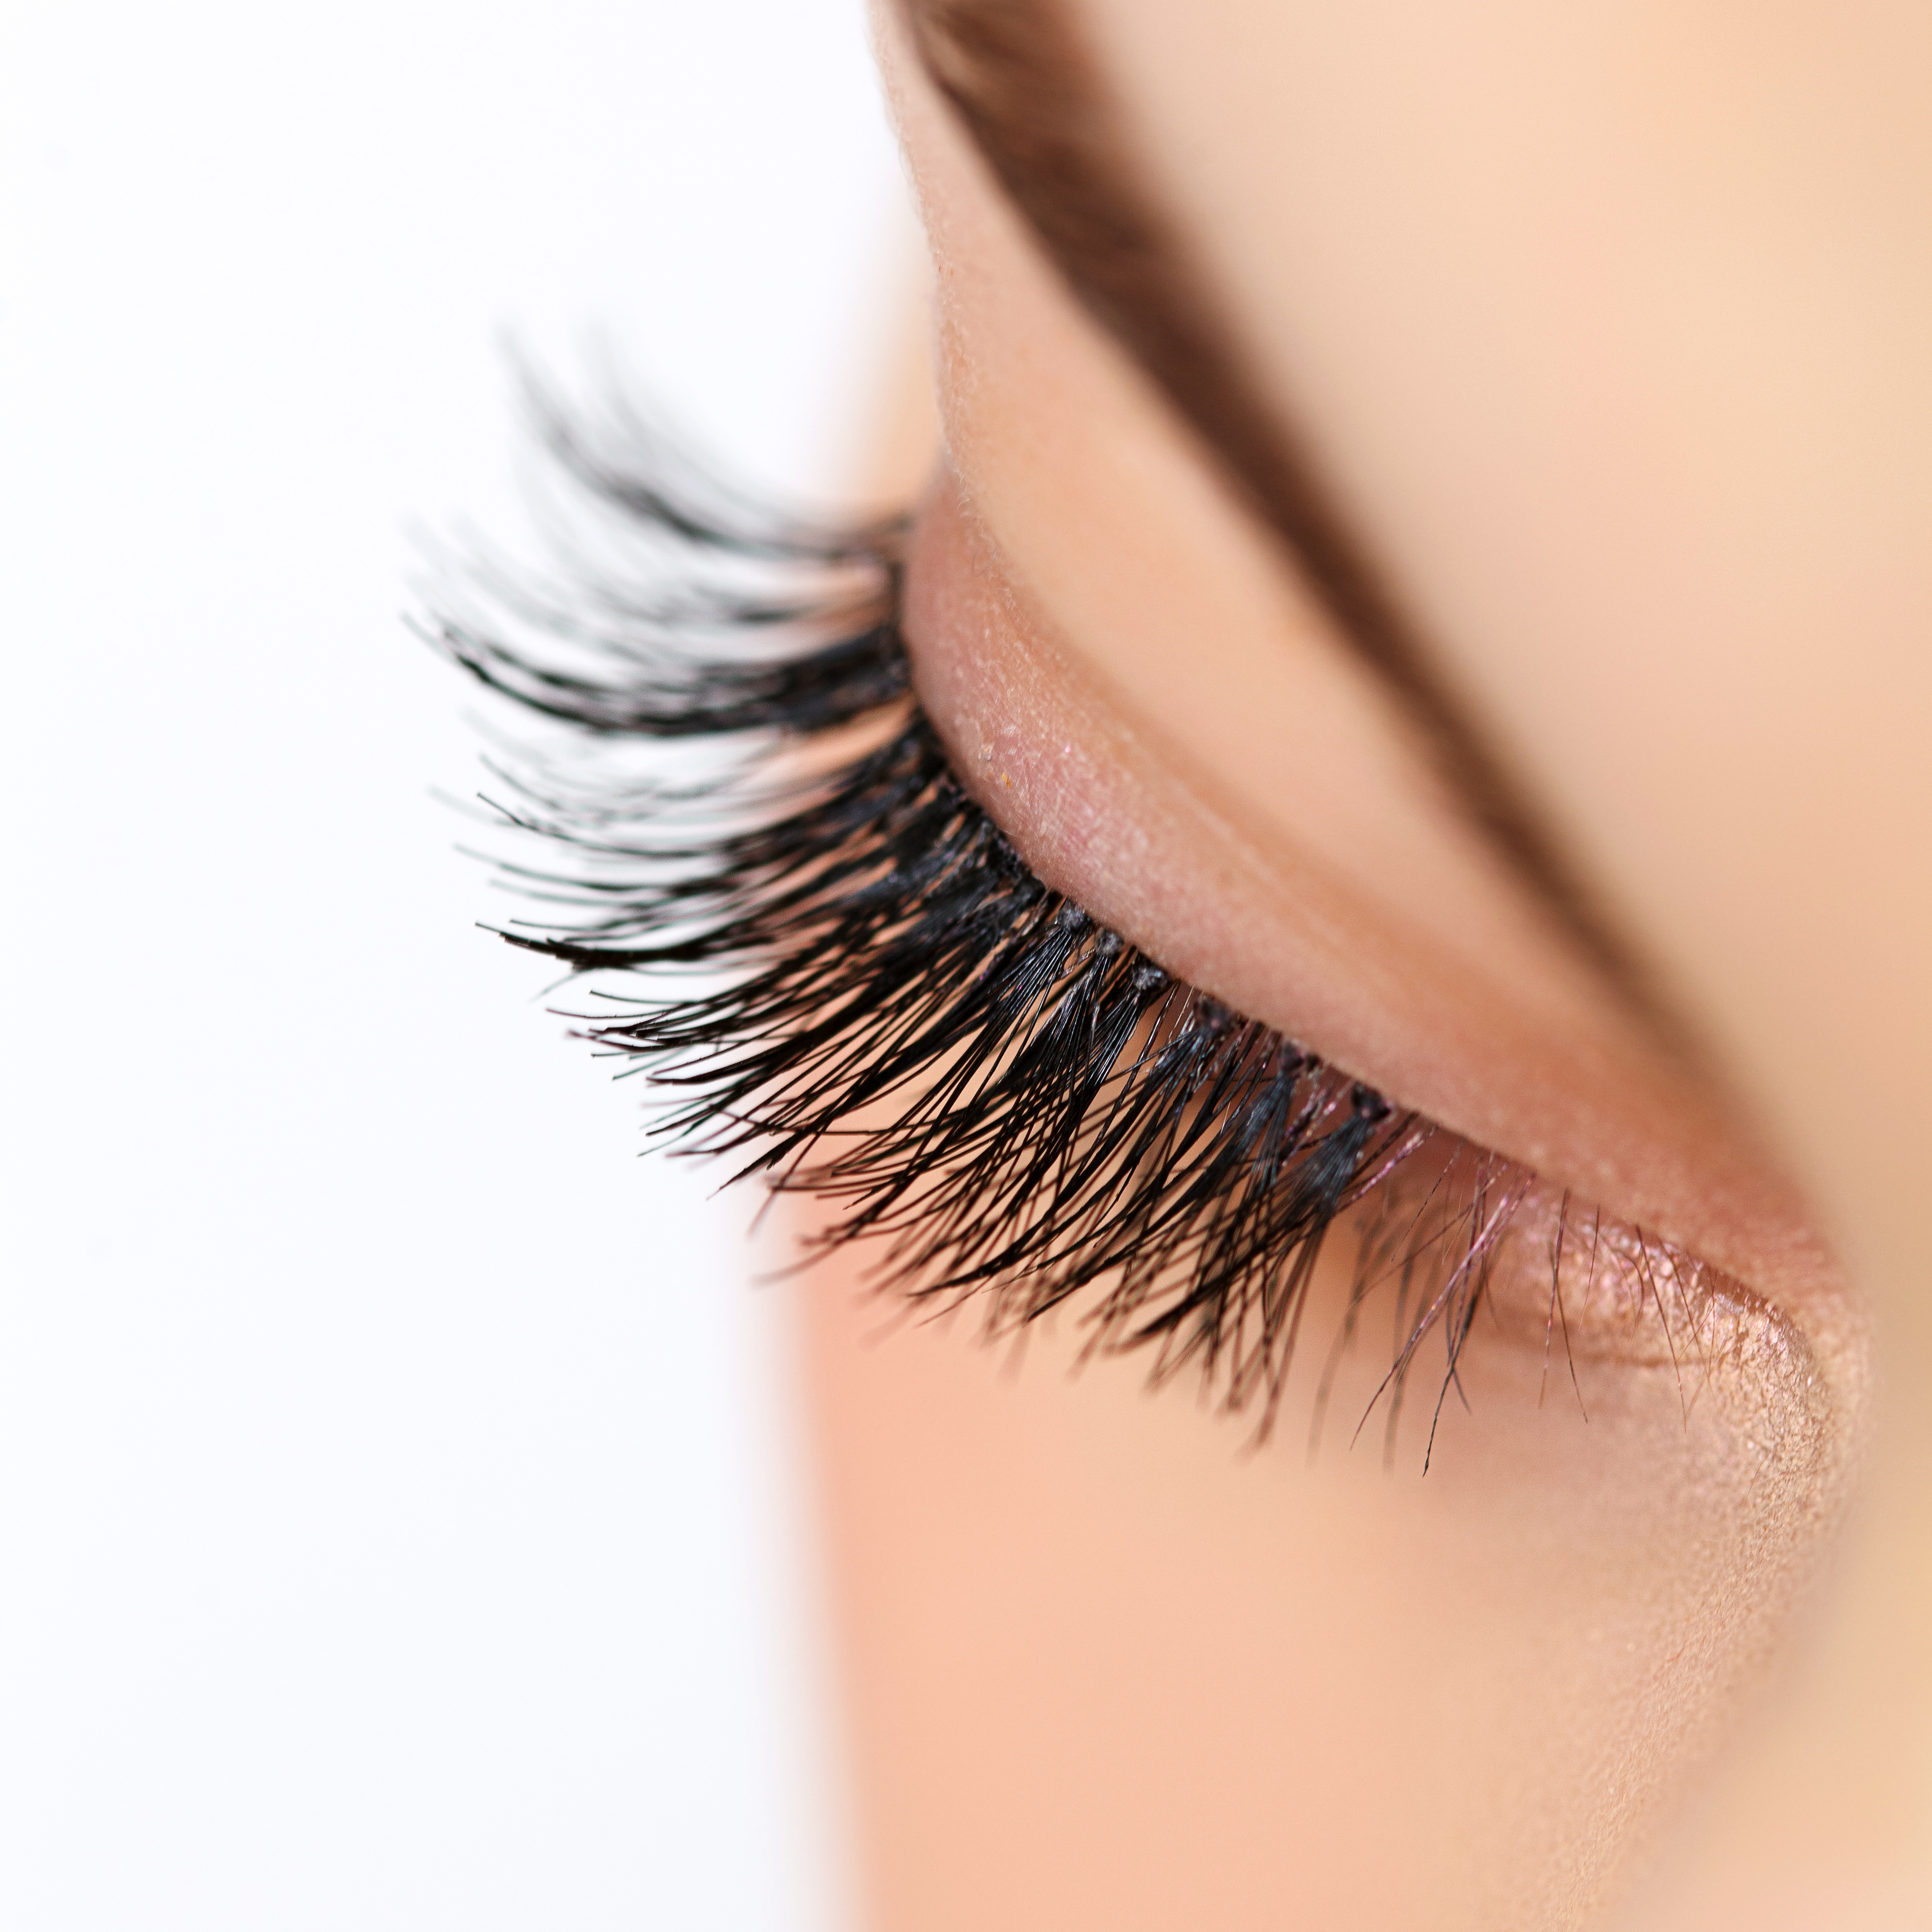 a72b975601d Can You Trim Eyelashes? | LEAFtv